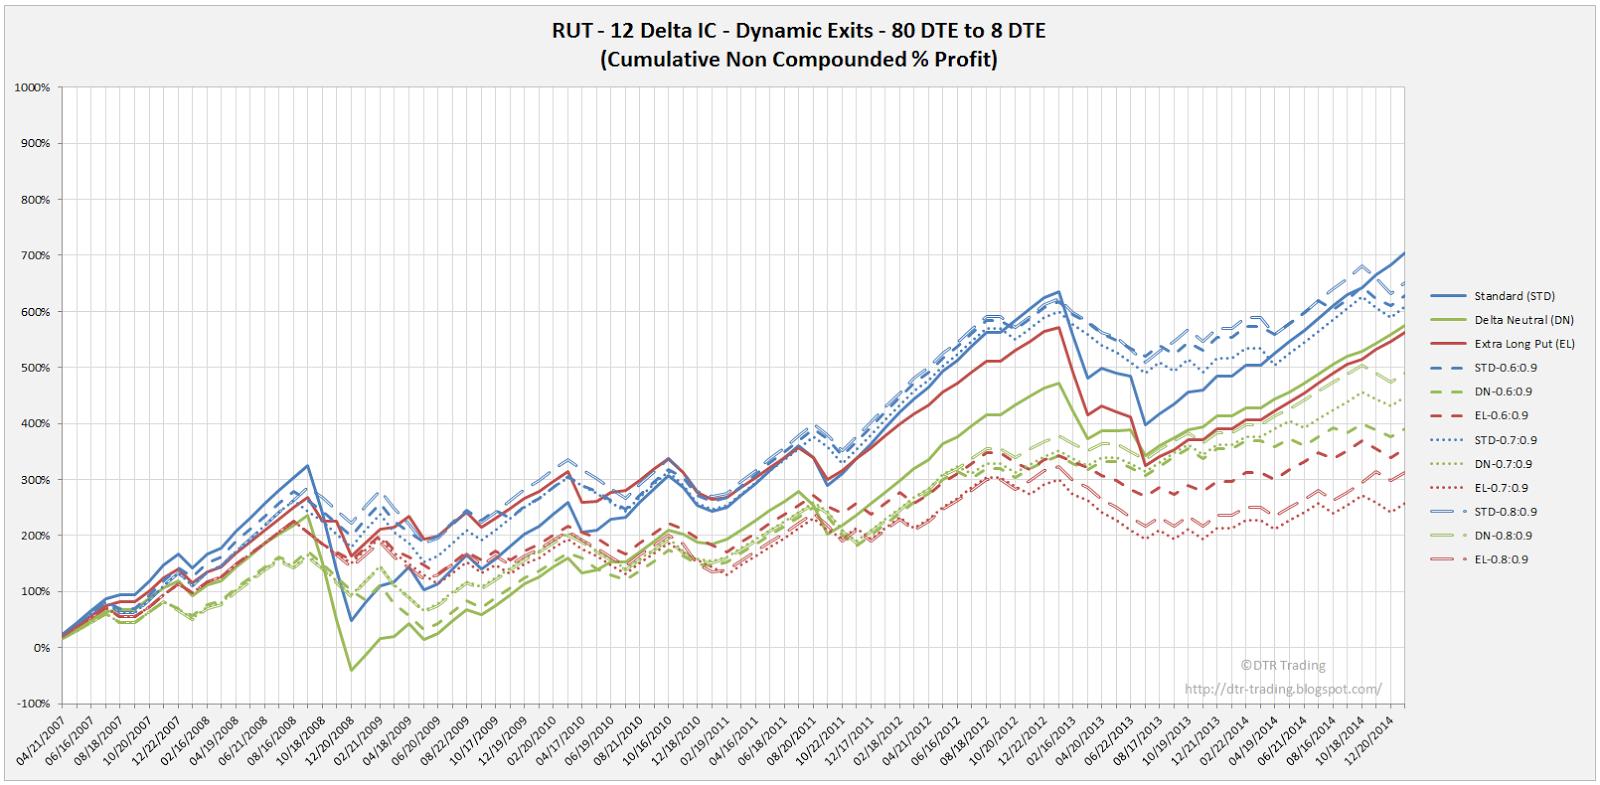 Iron Condor Dynamic Exit Equity Curves RUT 80 DTE 12 Delta Risk:Reward Versions